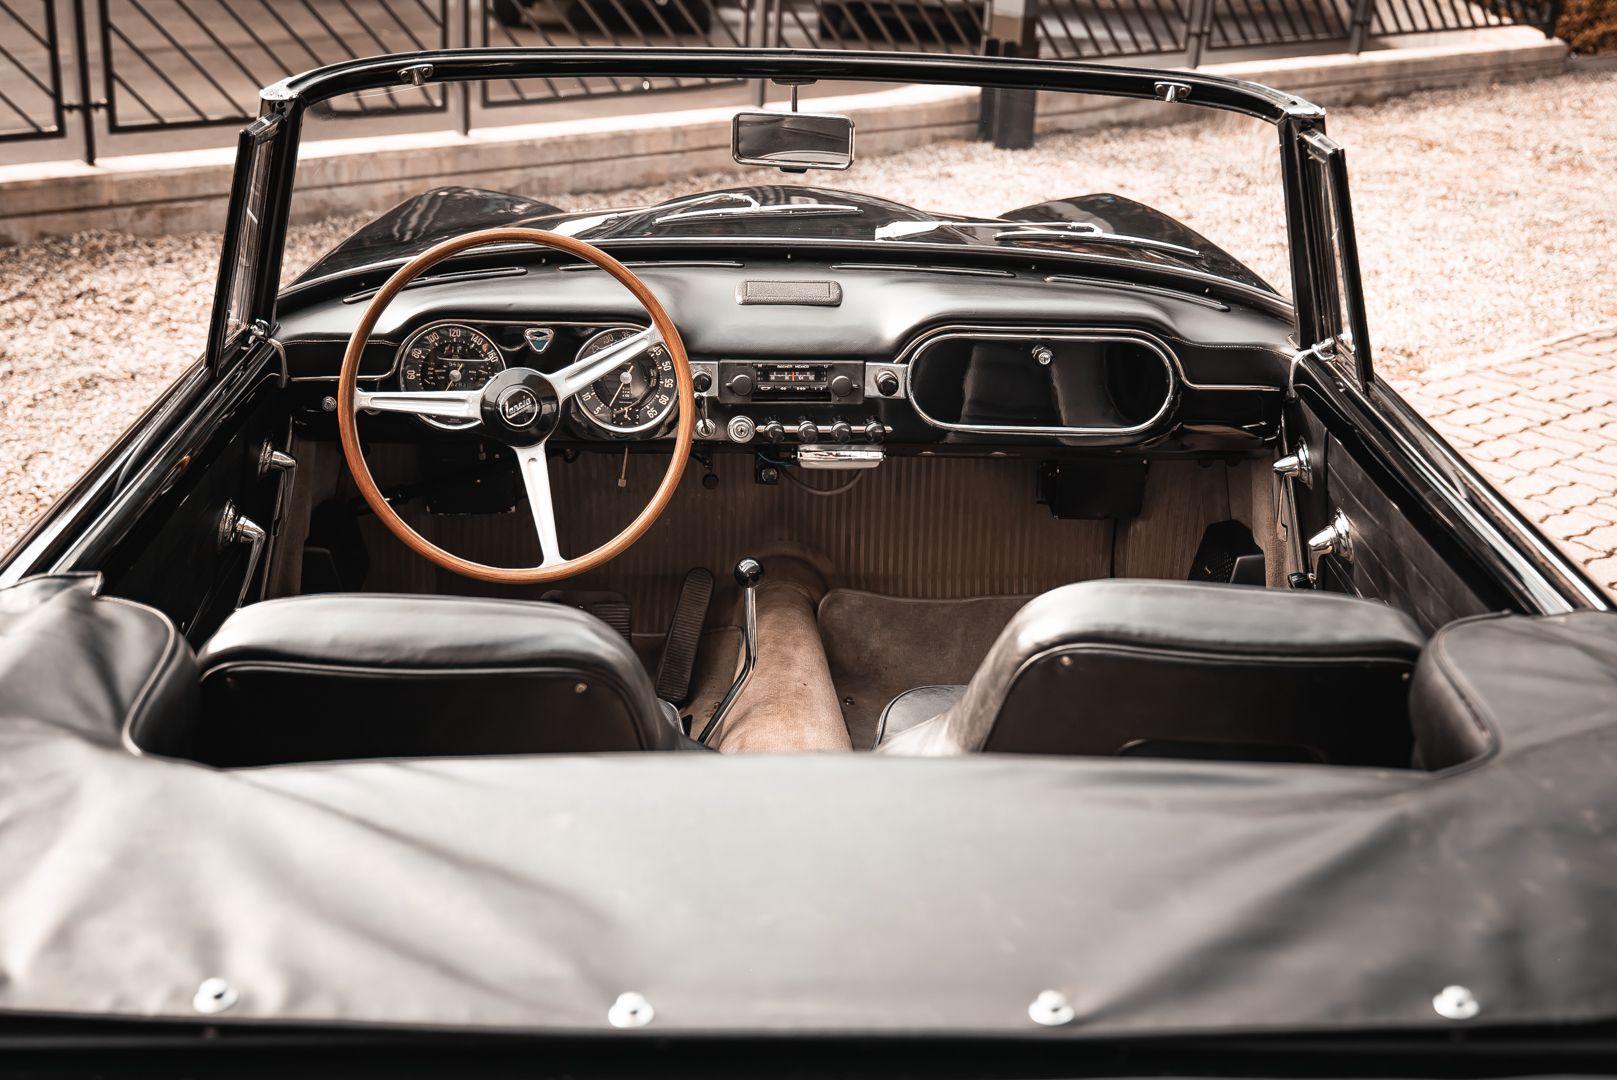 1968 Lancia Flaminia Touring Convertible 2800 3C 79121